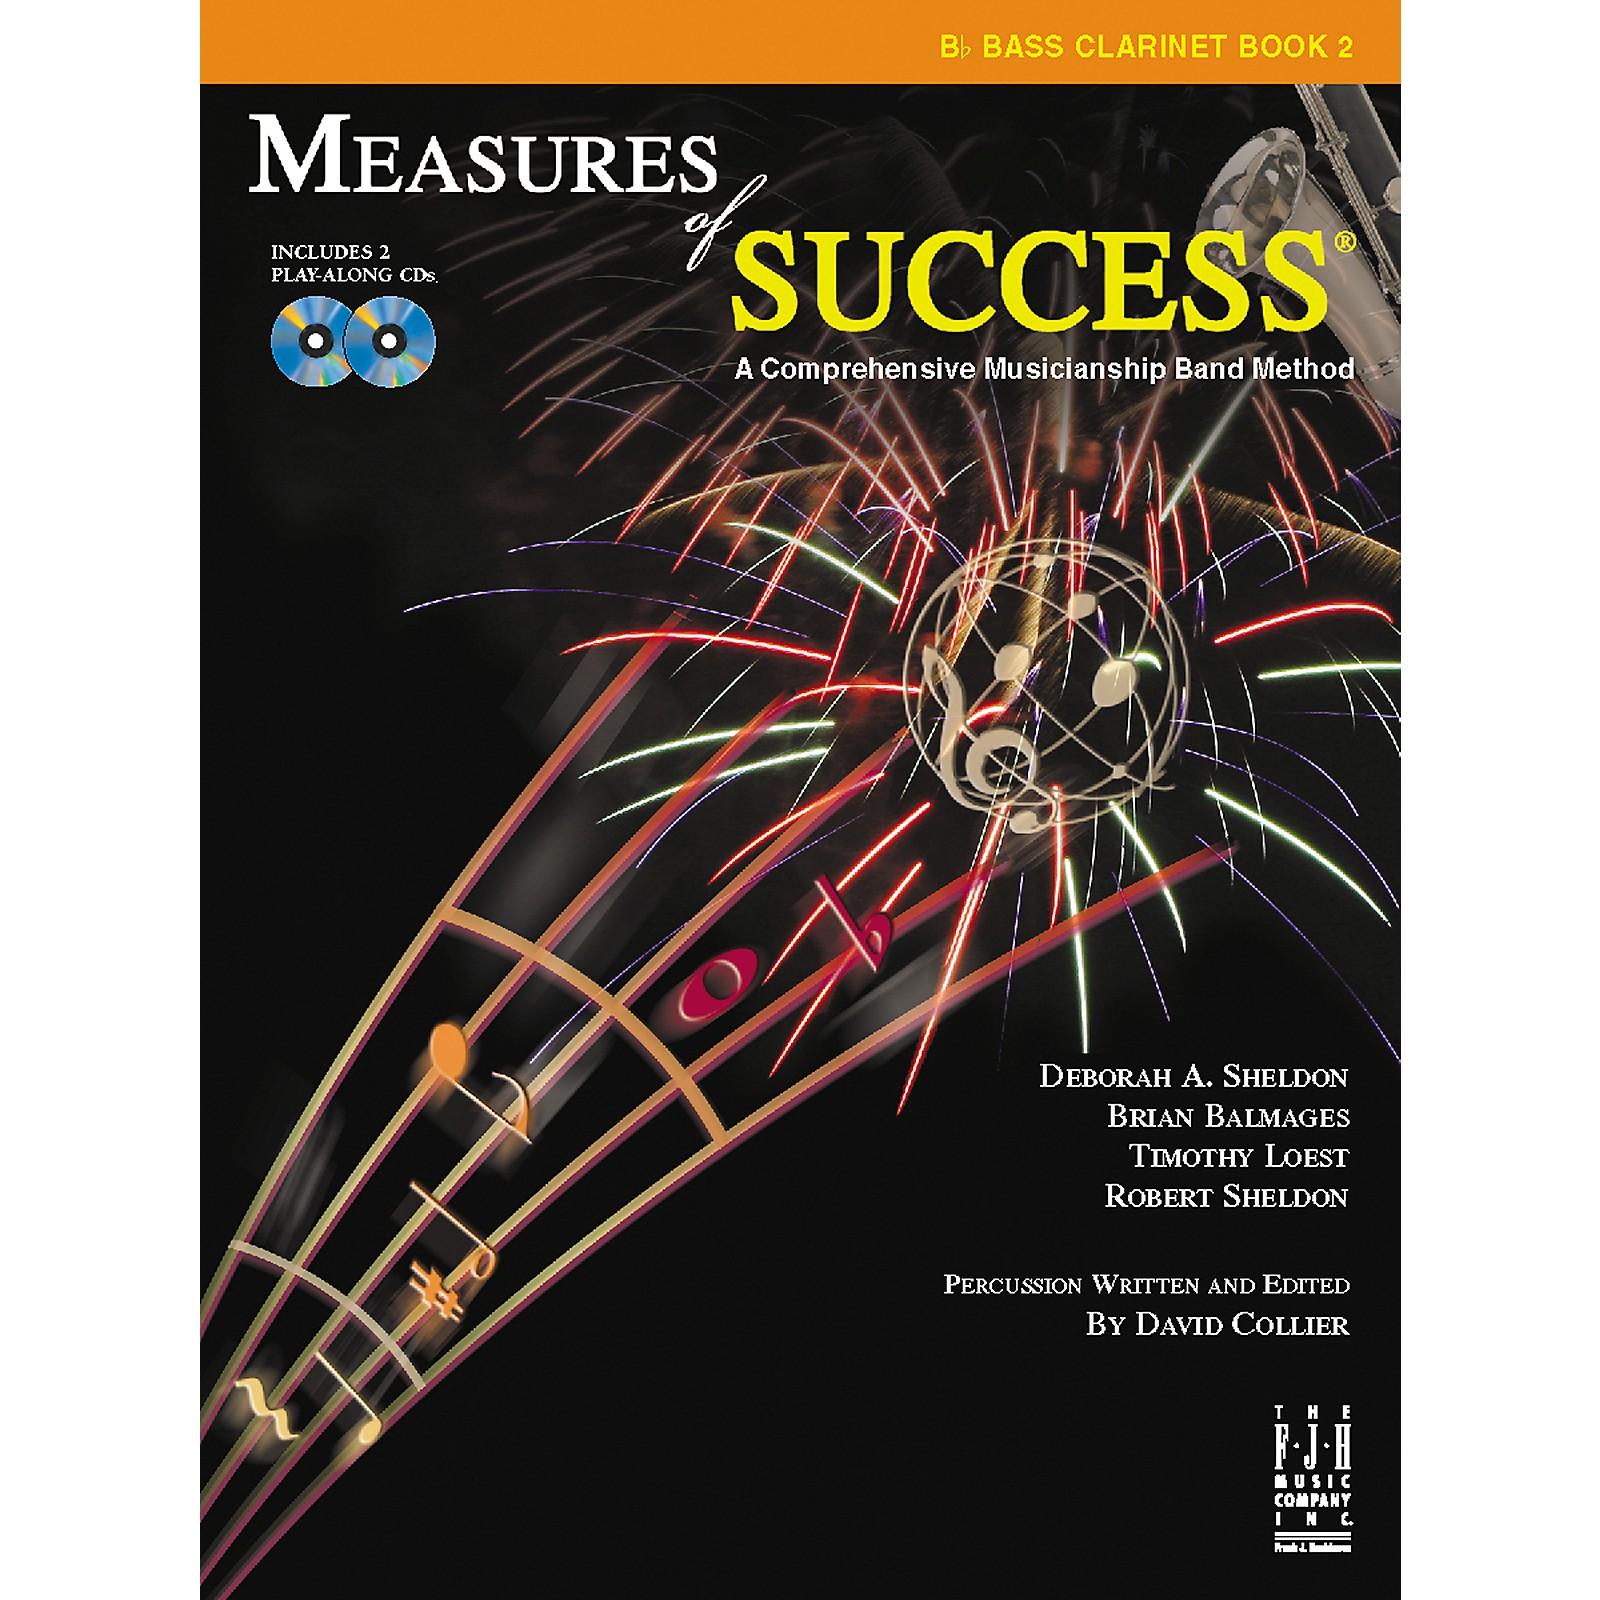 FJH Music Measures of Success Bass Clarinet Book 2